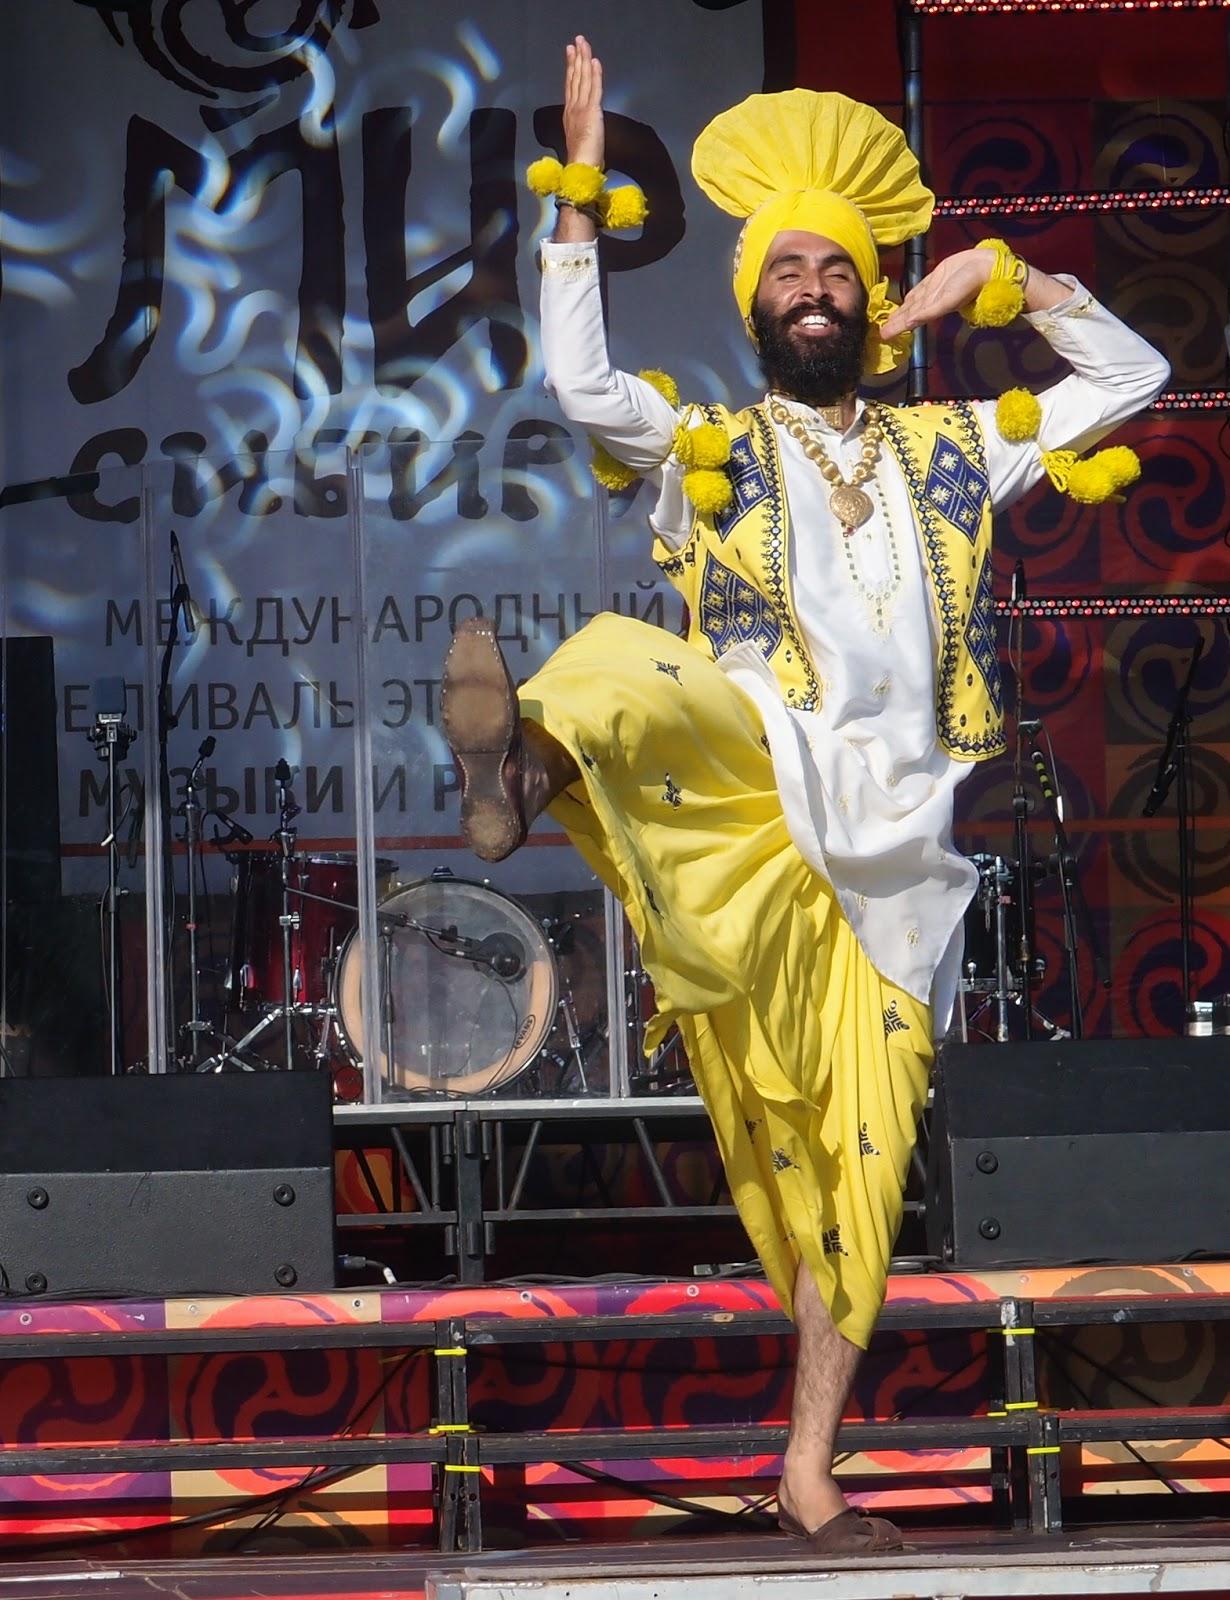 Mir Sibirin tanssija